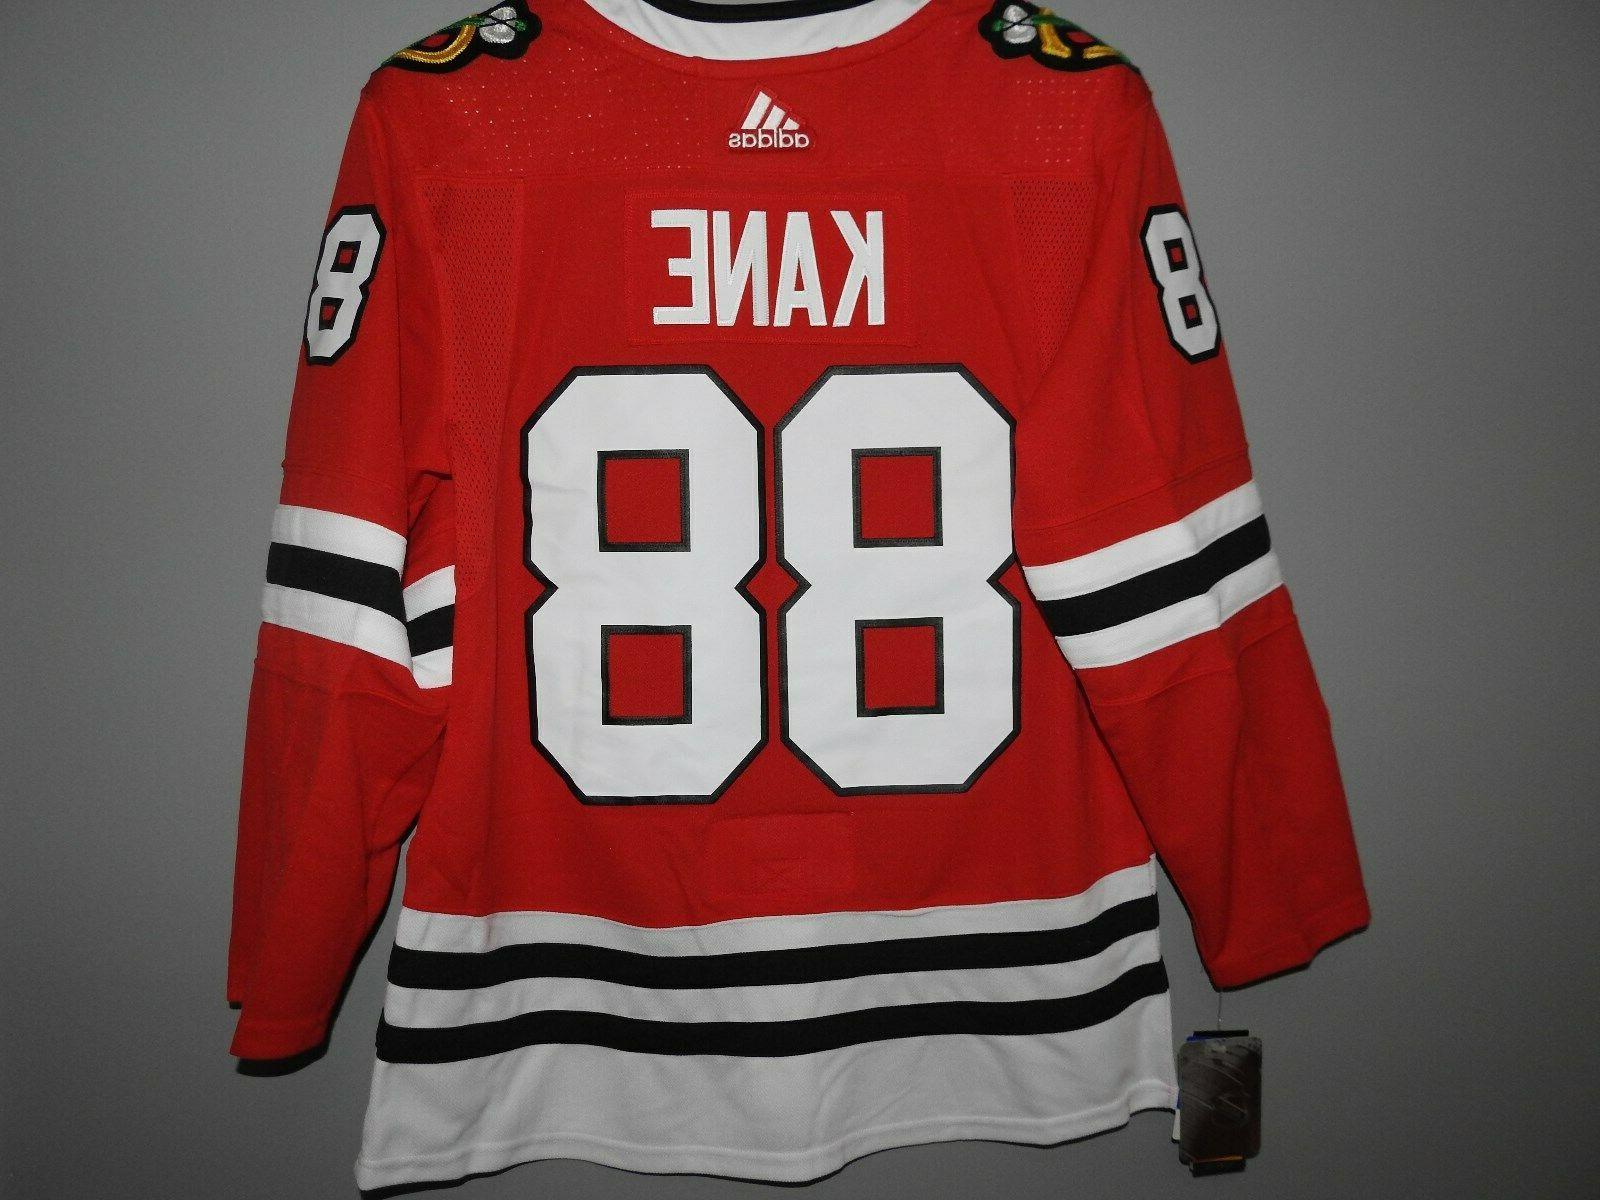 Authentic NHL Blackhawks Hockey Jersey New